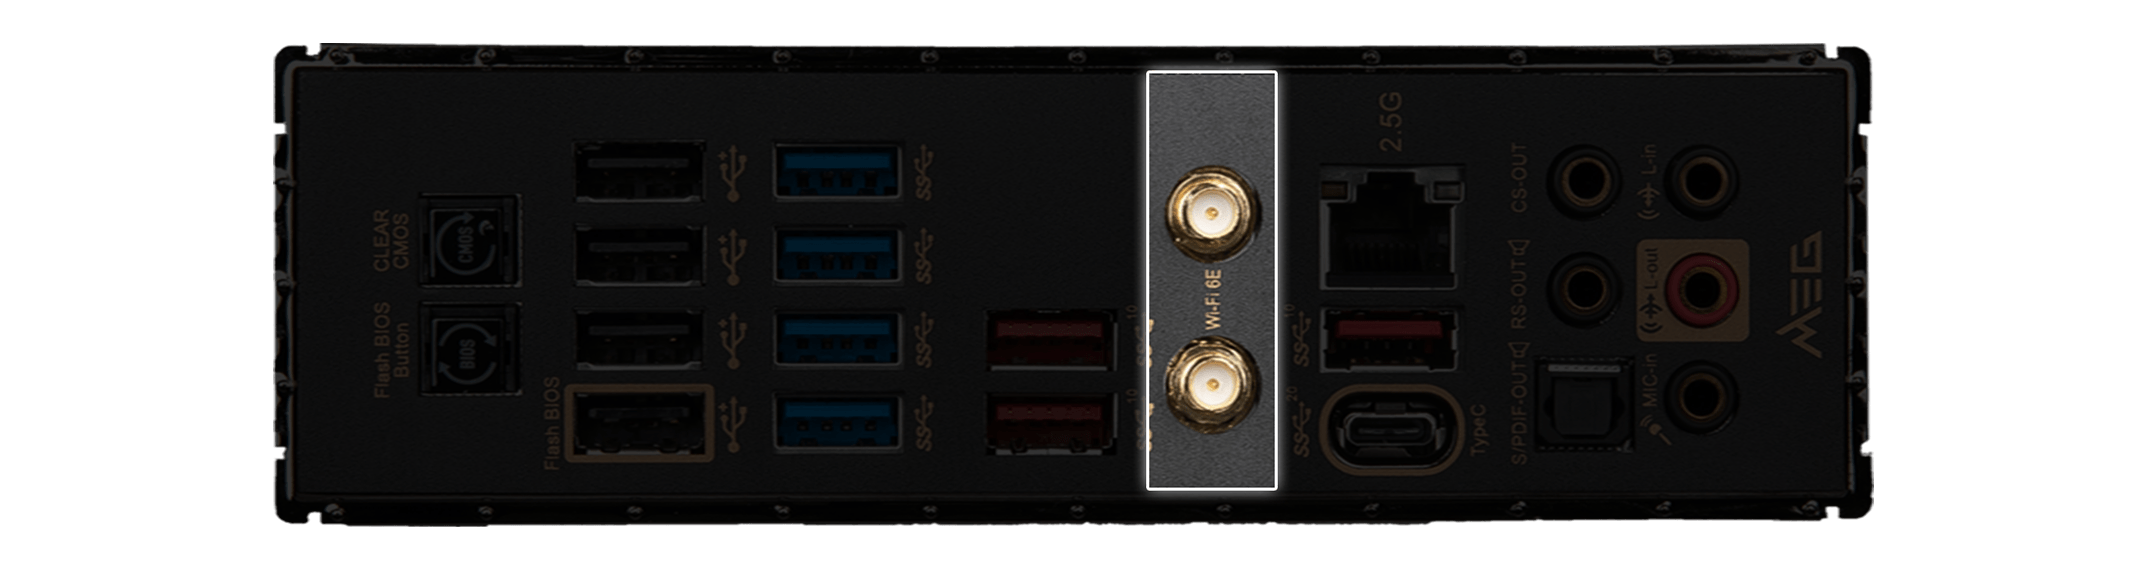 MSI X570S Motherboard Faster Wi-Fi 6E